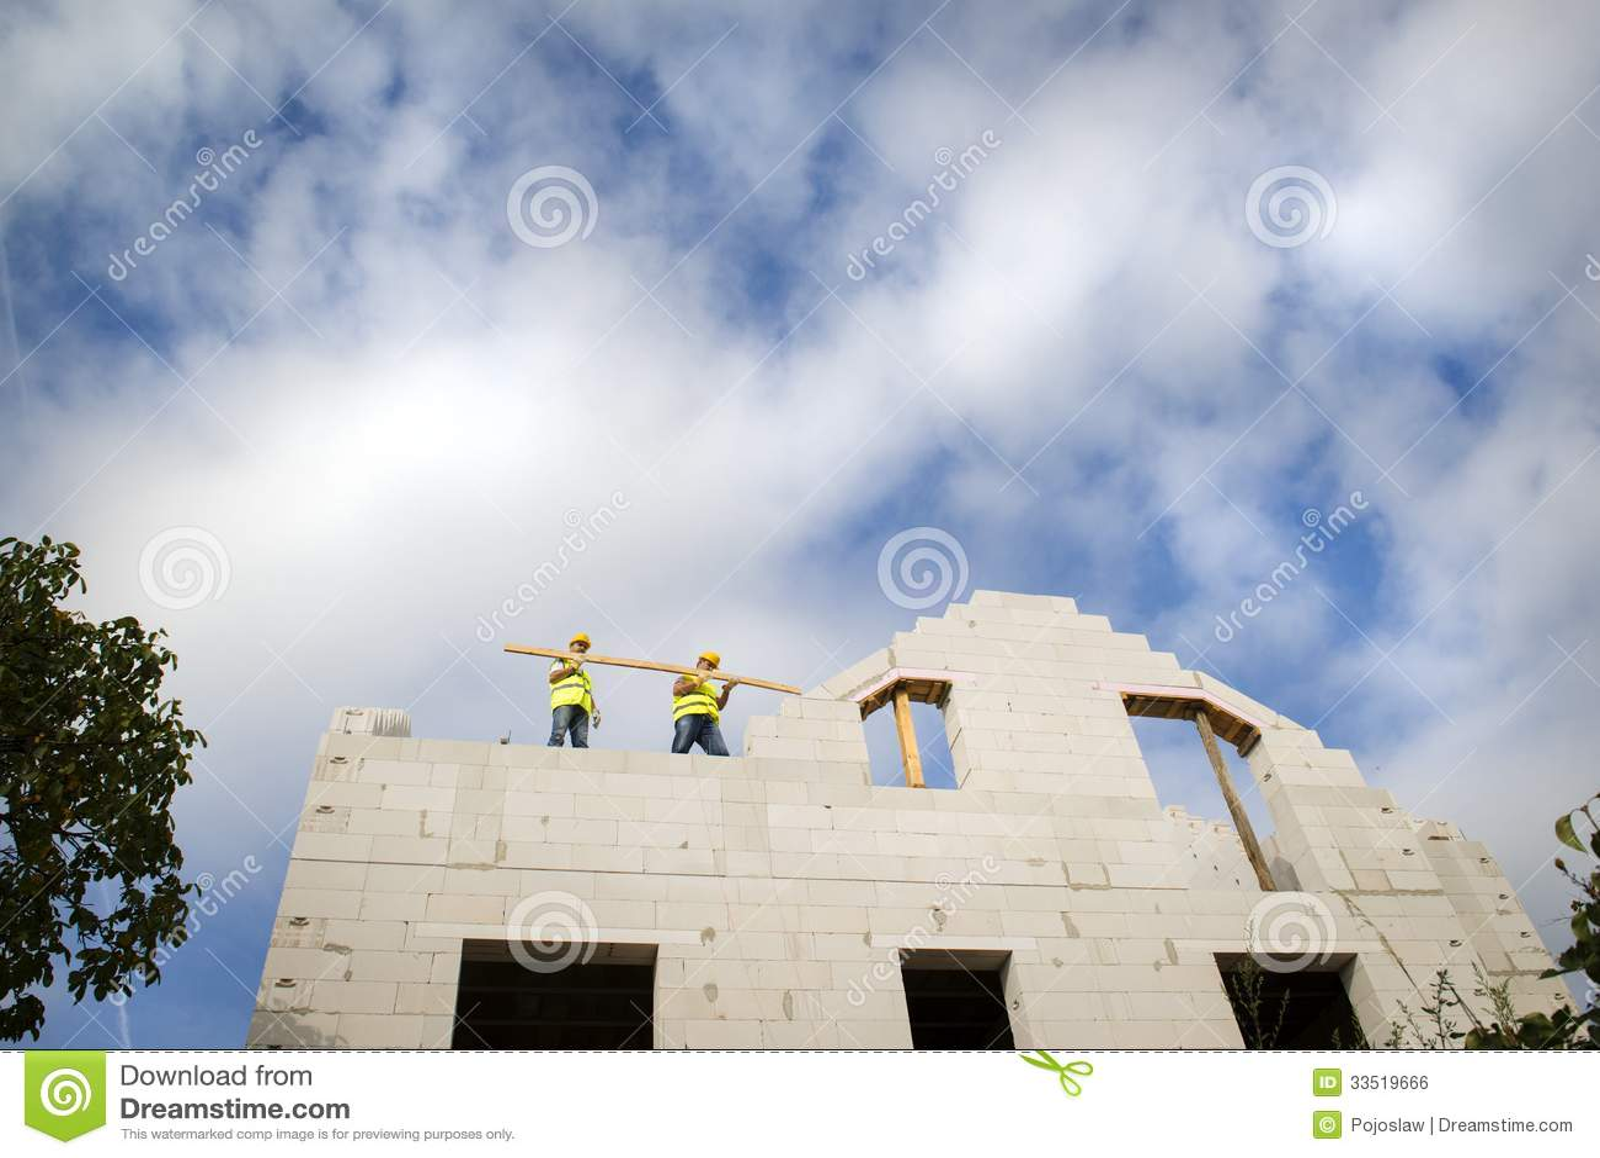 House Construction Royalty Free Stock Image Image 33519666